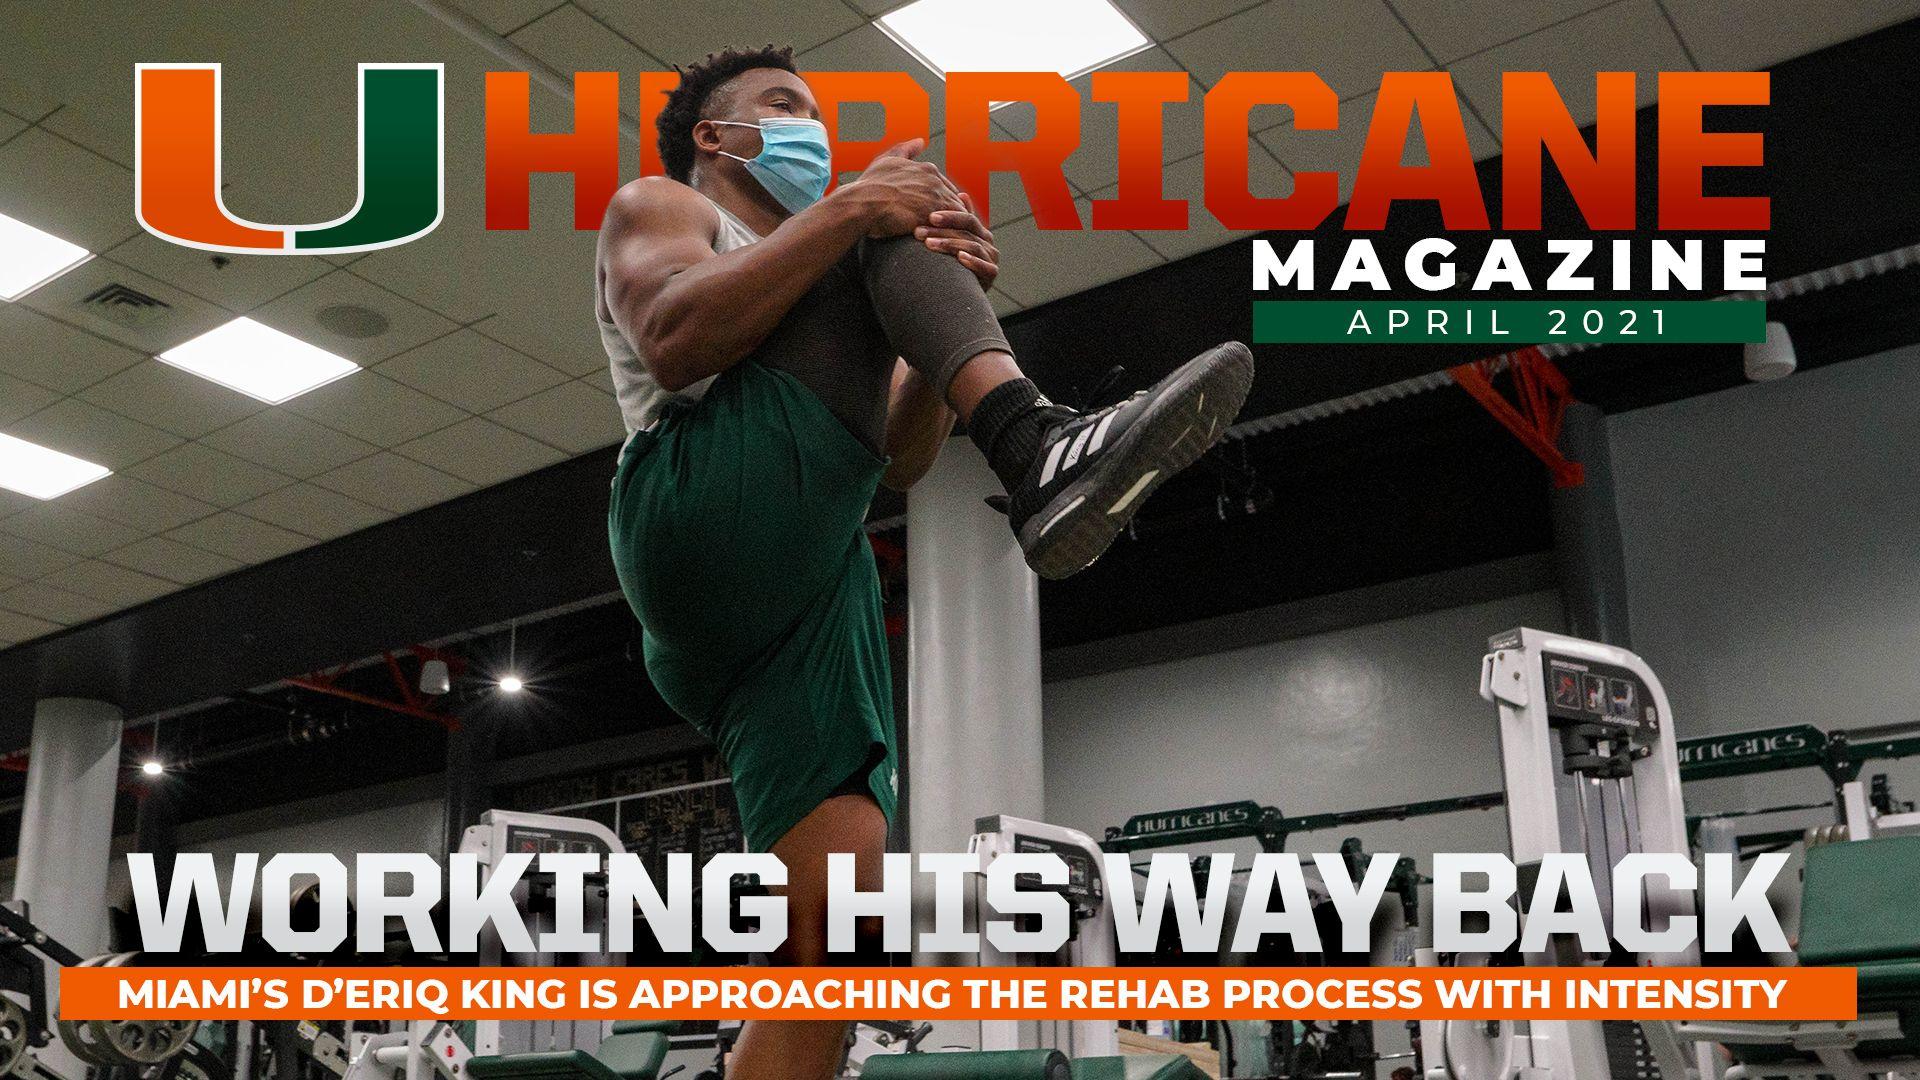 Hurricane Magazine: April 2021